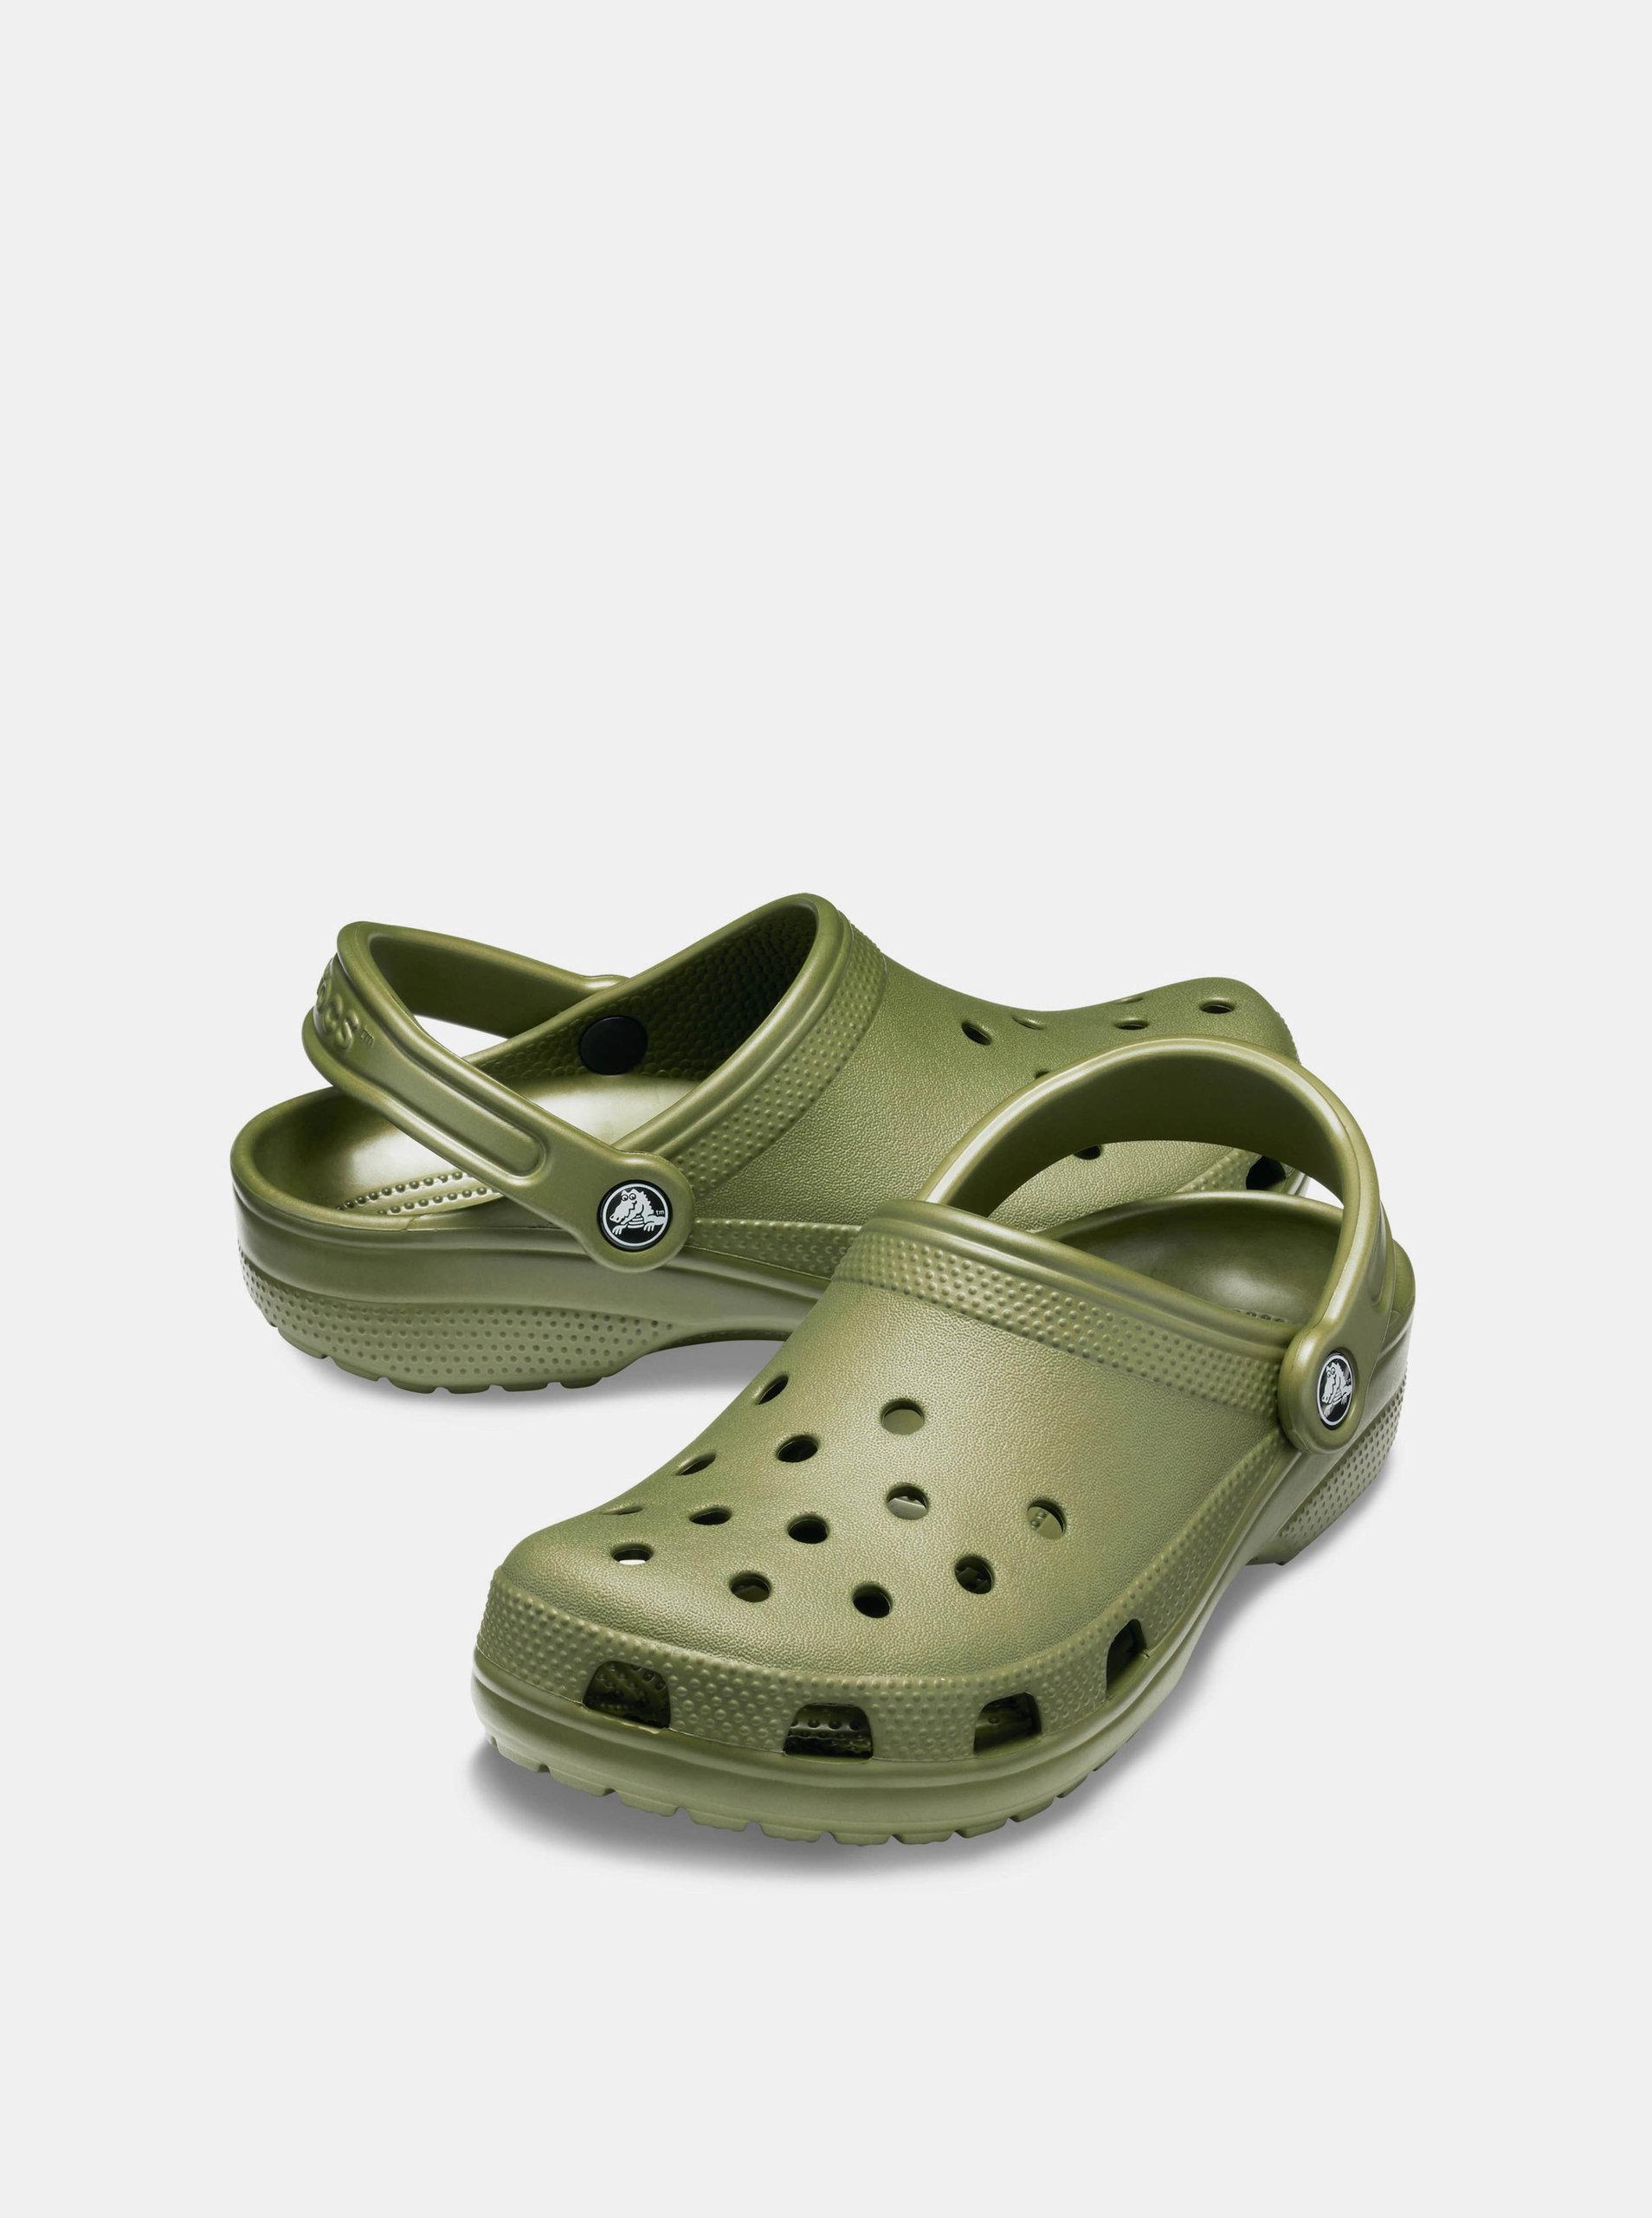 c11483cd24fb5 Kaki pánske šľapky Crocs Classic | ZOOT.sk